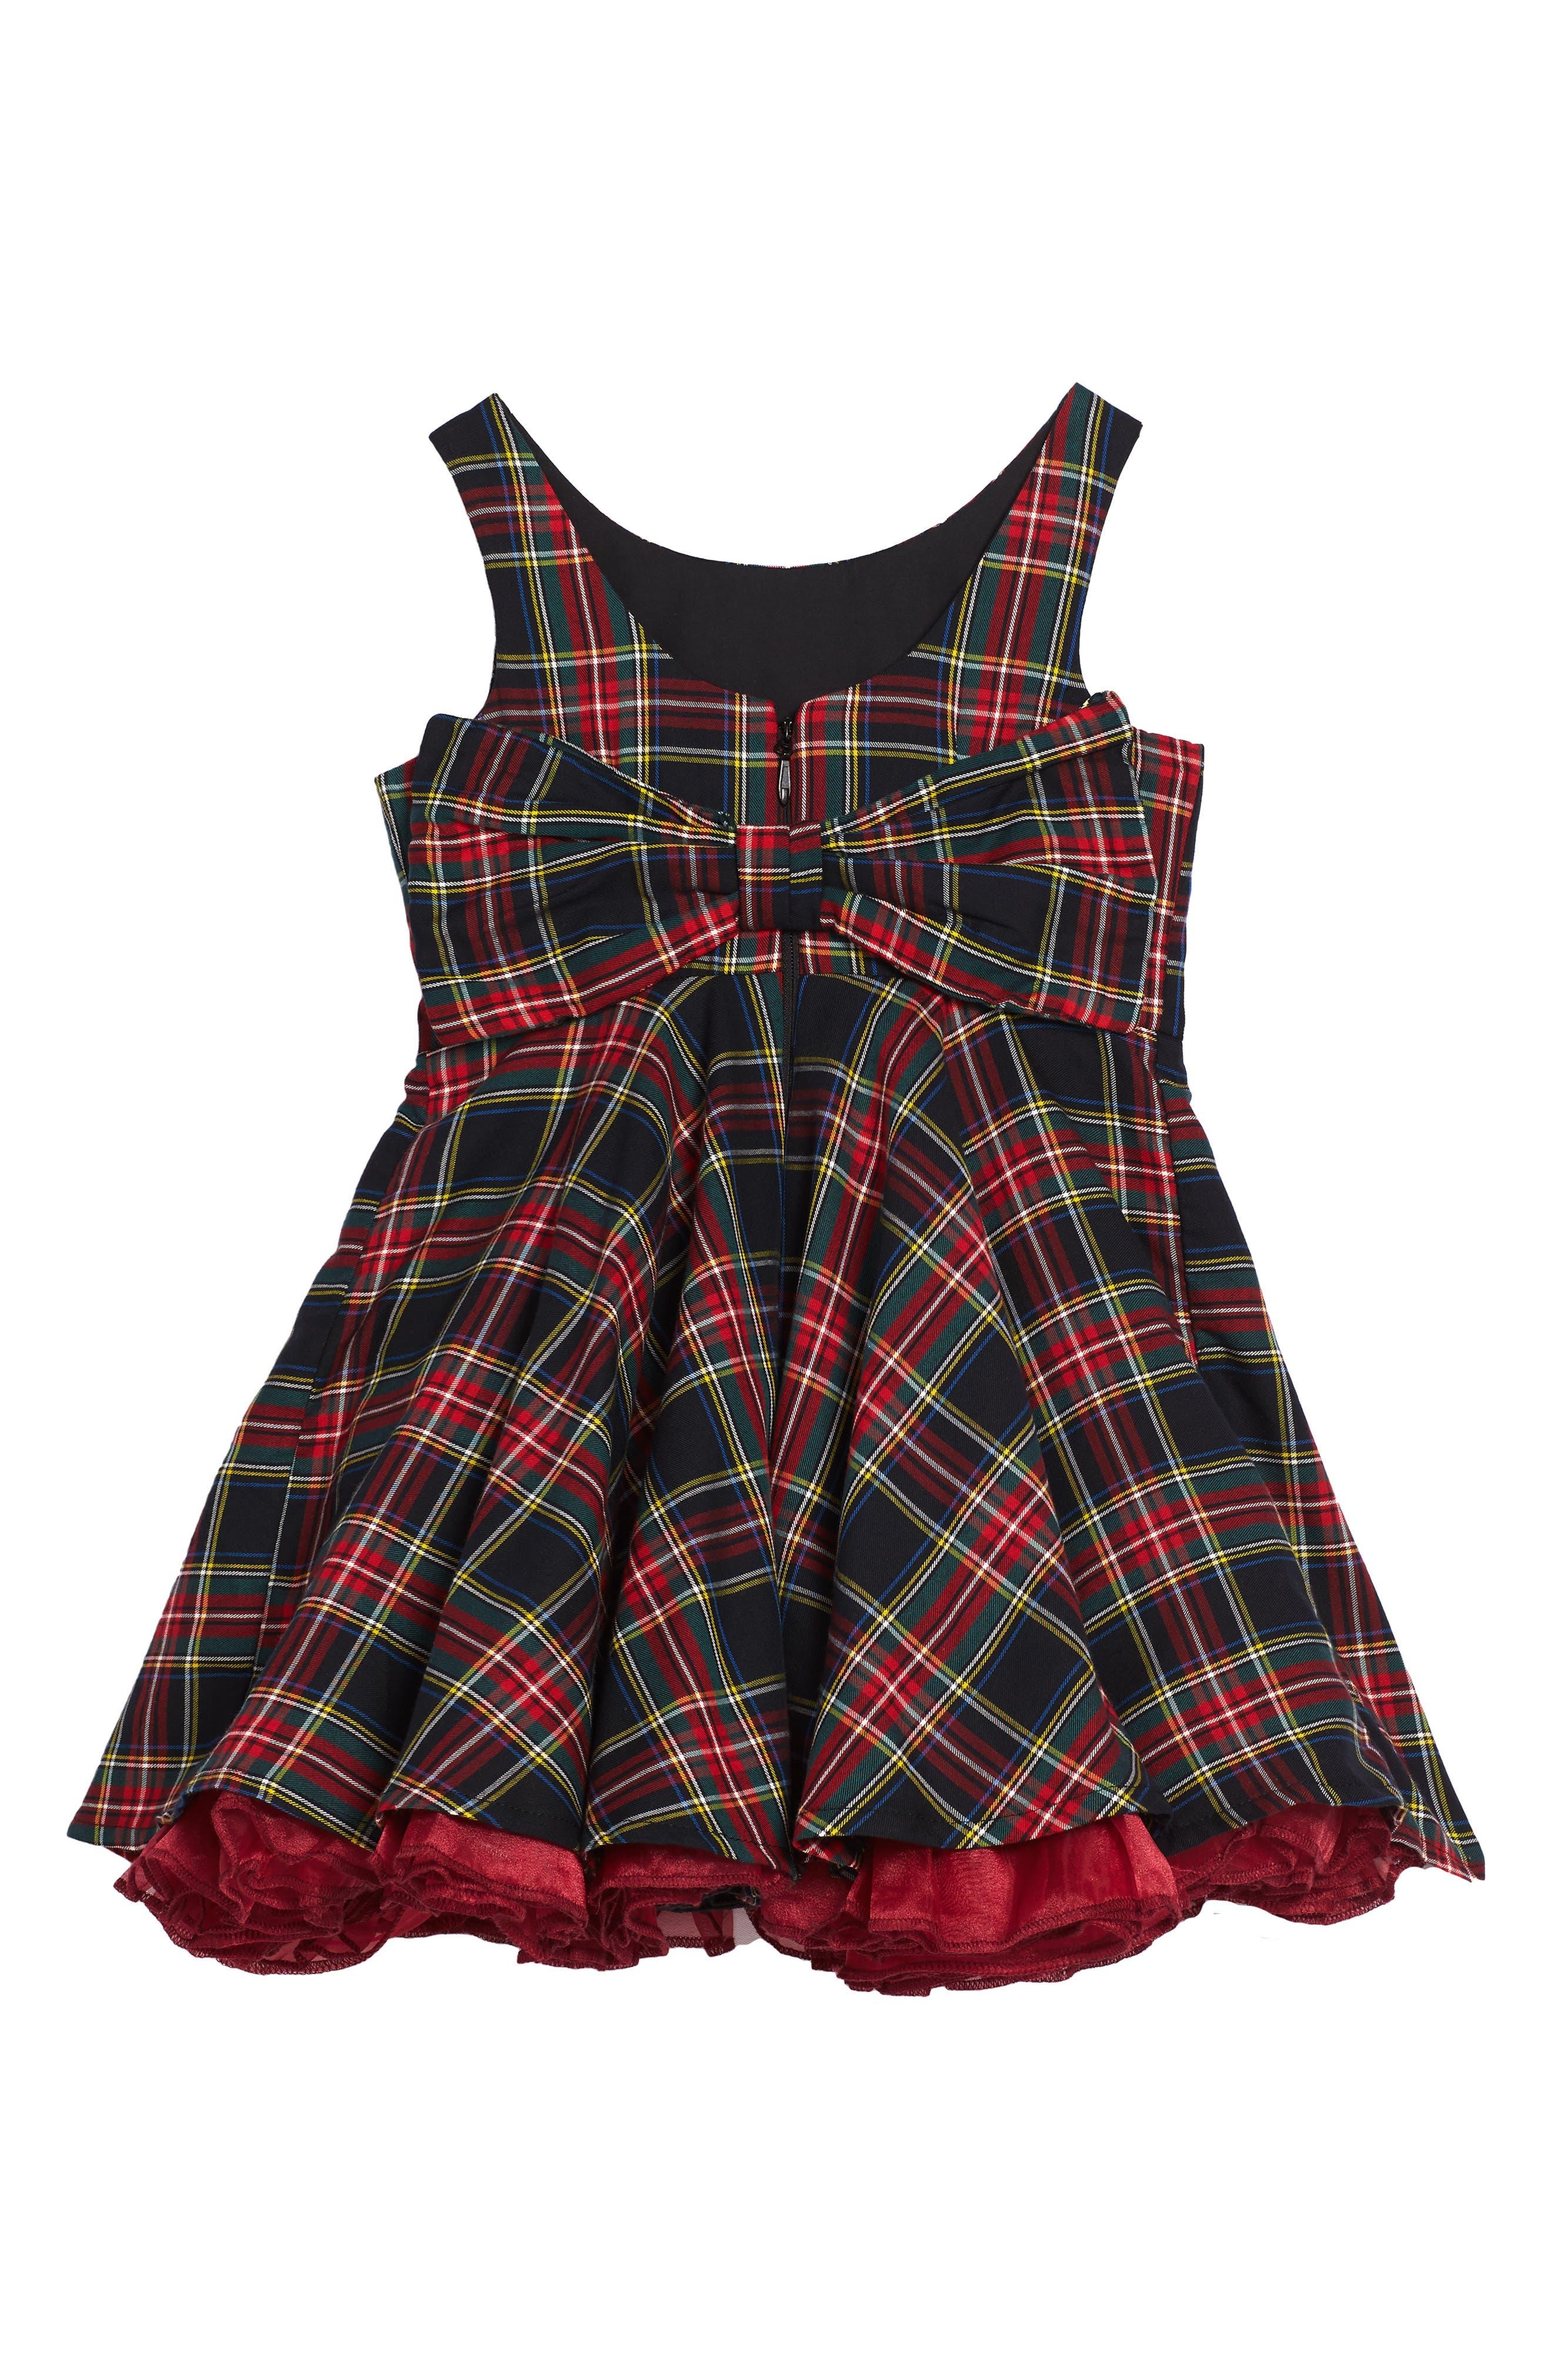 Tartan Party Dress,                             Alternate thumbnail 2, color,                             600